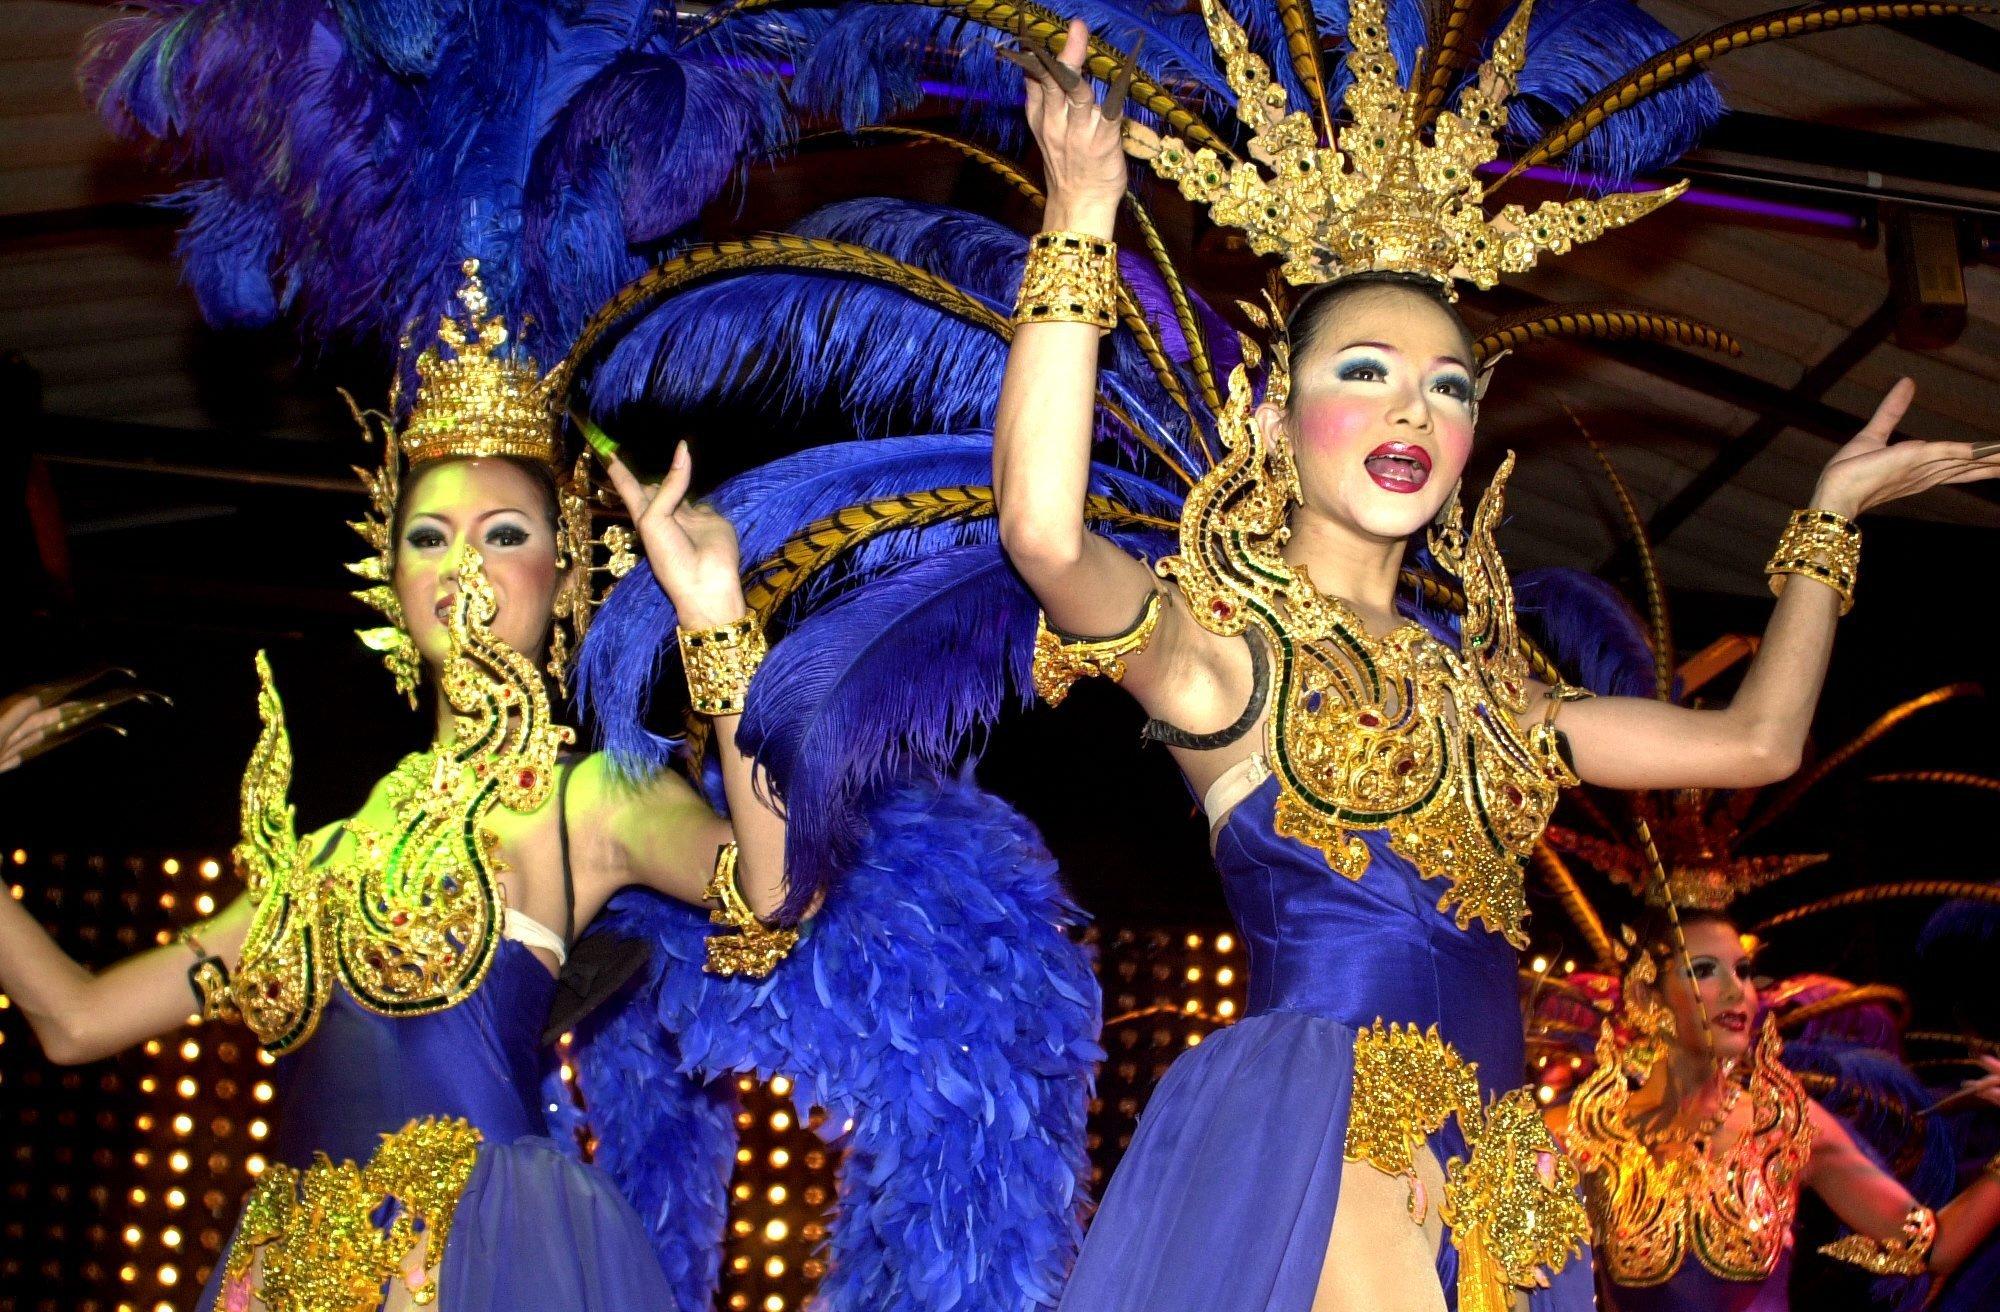 Actor dancer homosexual discrimination